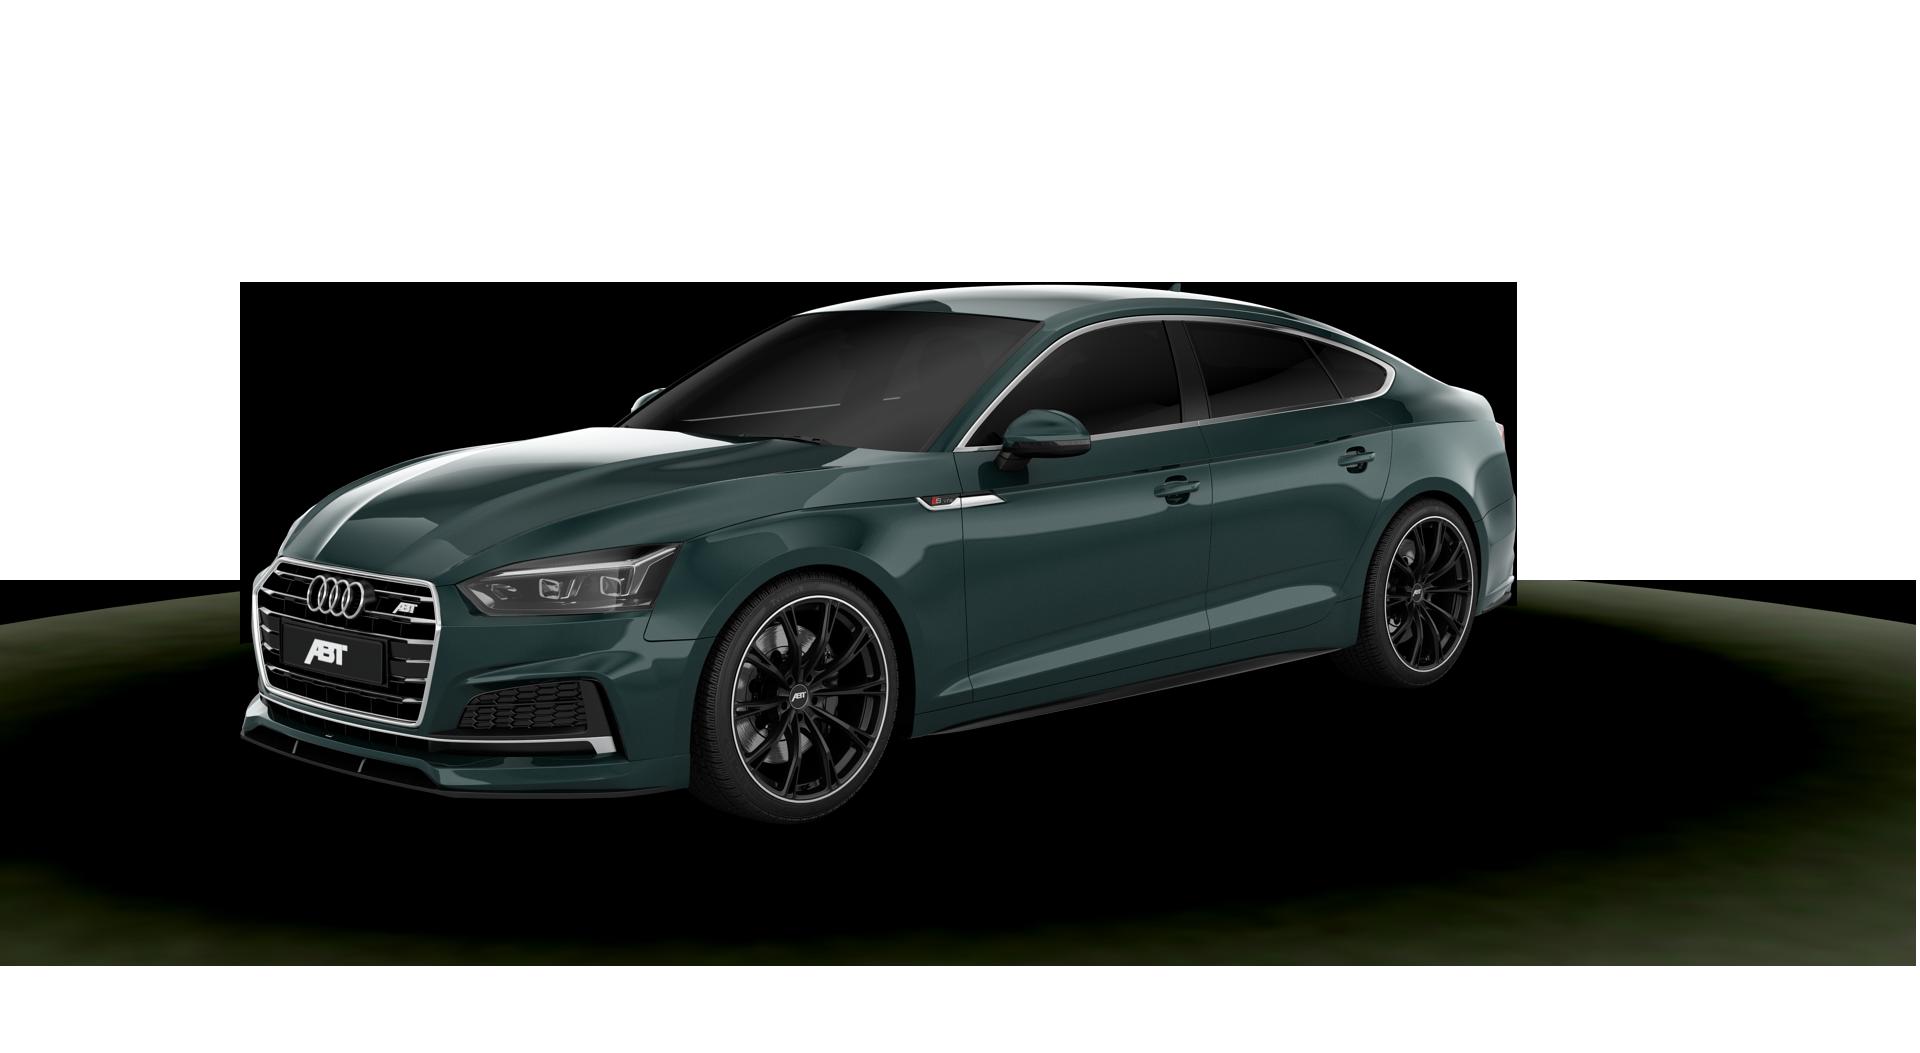 Audi A5 Abt Sportsline